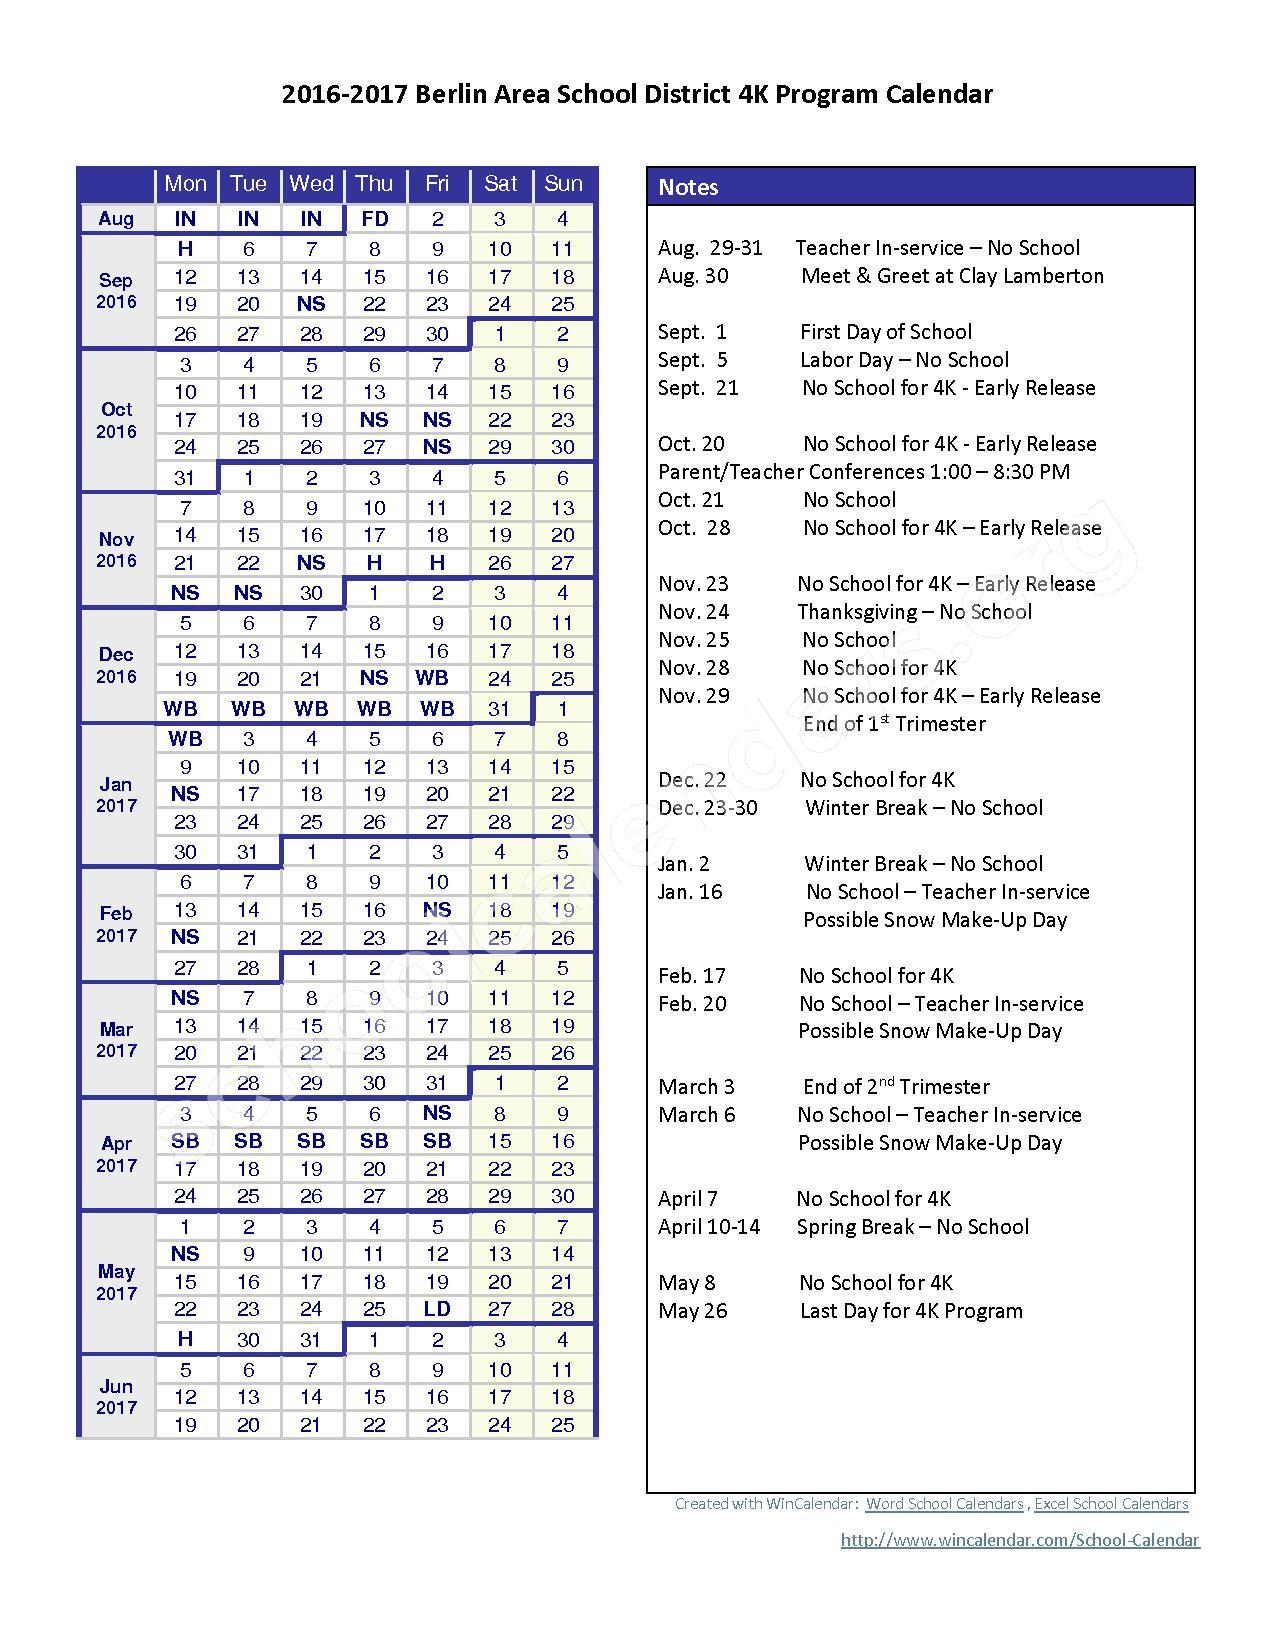 2016 - 2017 School Calendar – Berlin Area School District – page 1